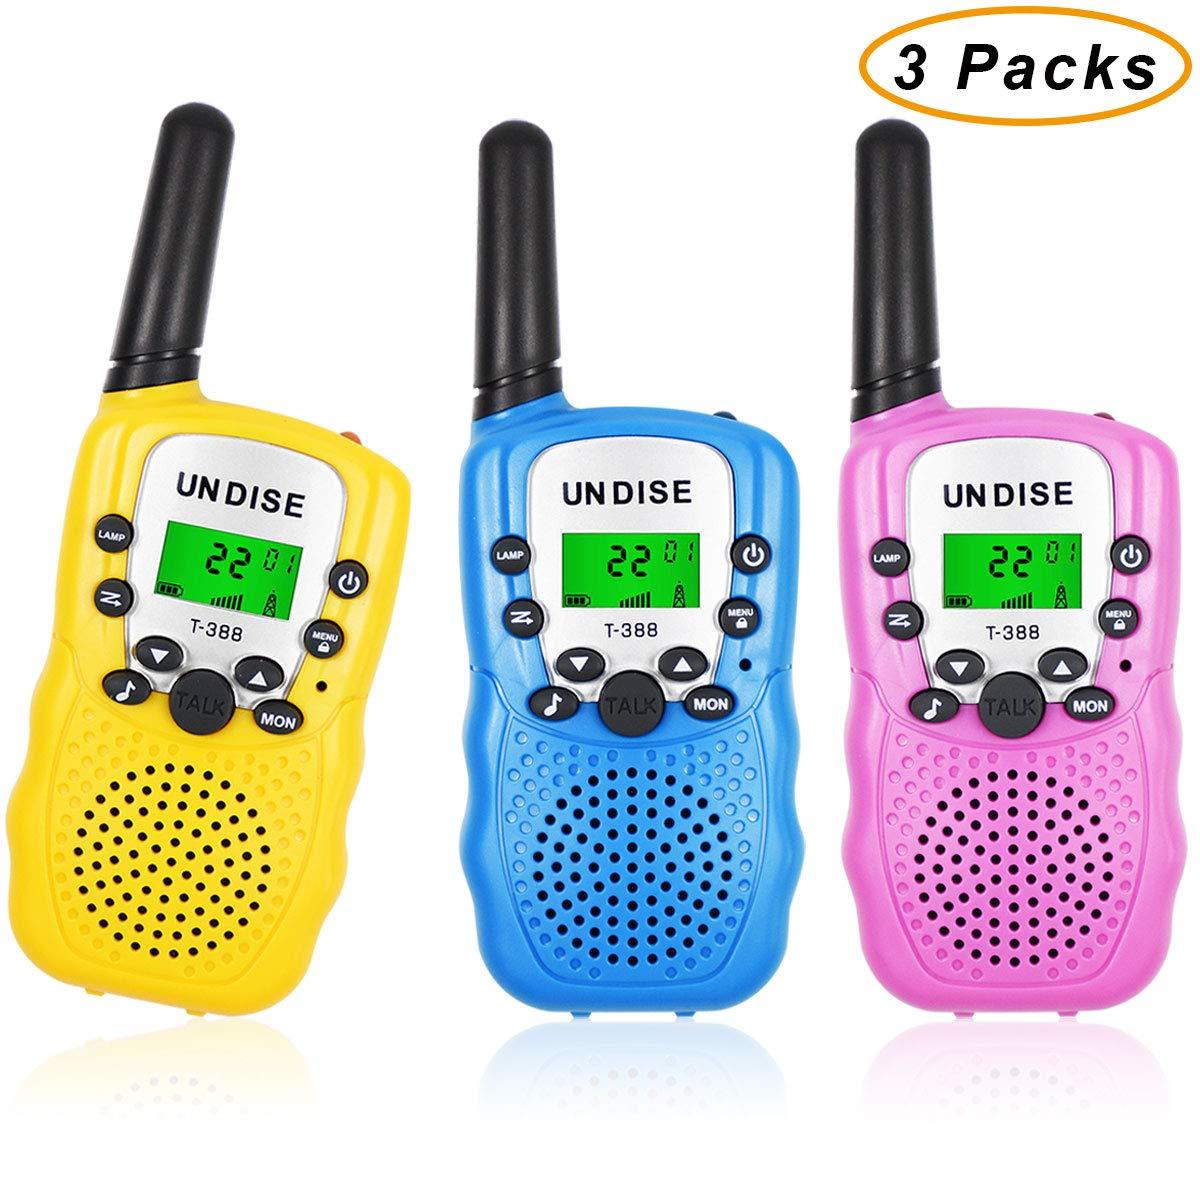 undise Walkie Talkies for Kids 3 Mile Range Mini 22 Channels 2 Way Radio Toy Kids Walkie Talkies with Flashlight for Outside Adventures, Camping, Hiking, 3 Packs